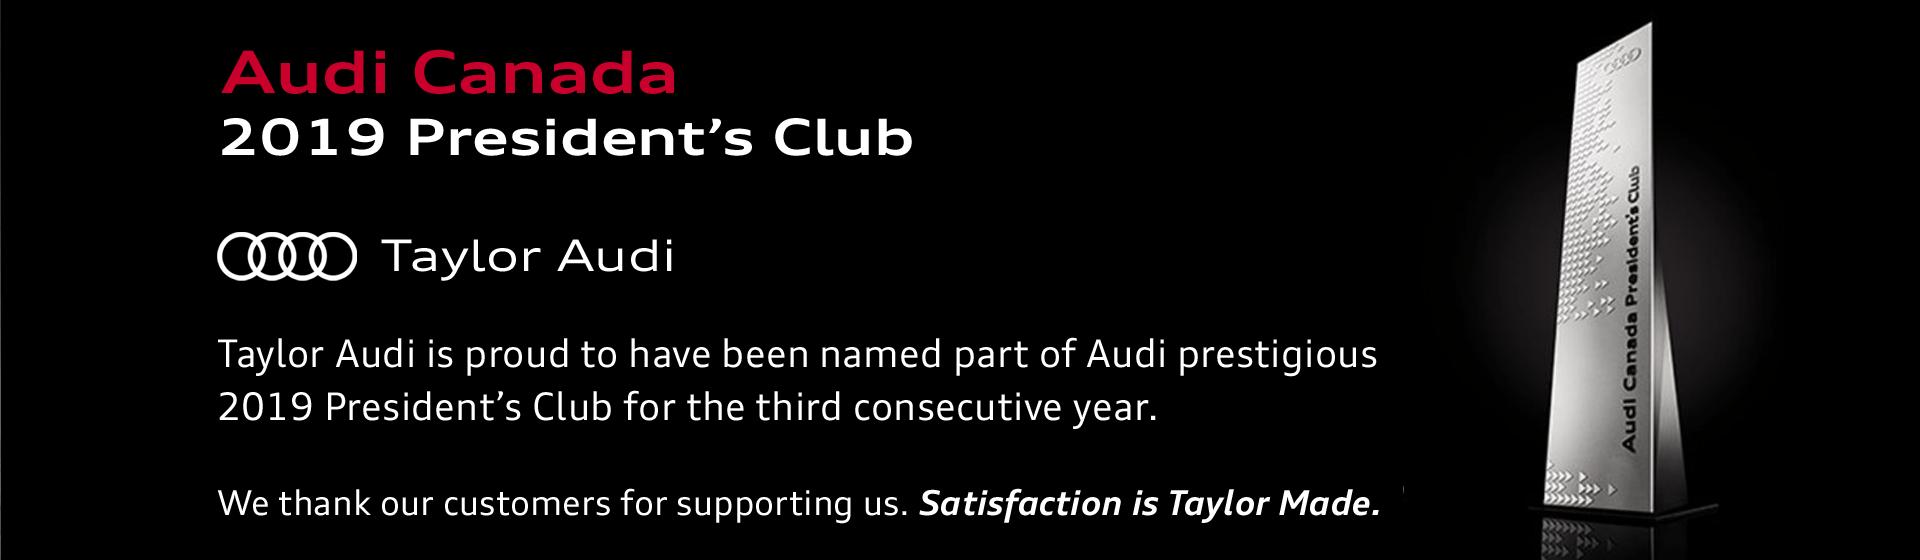 President's club 2019 slider